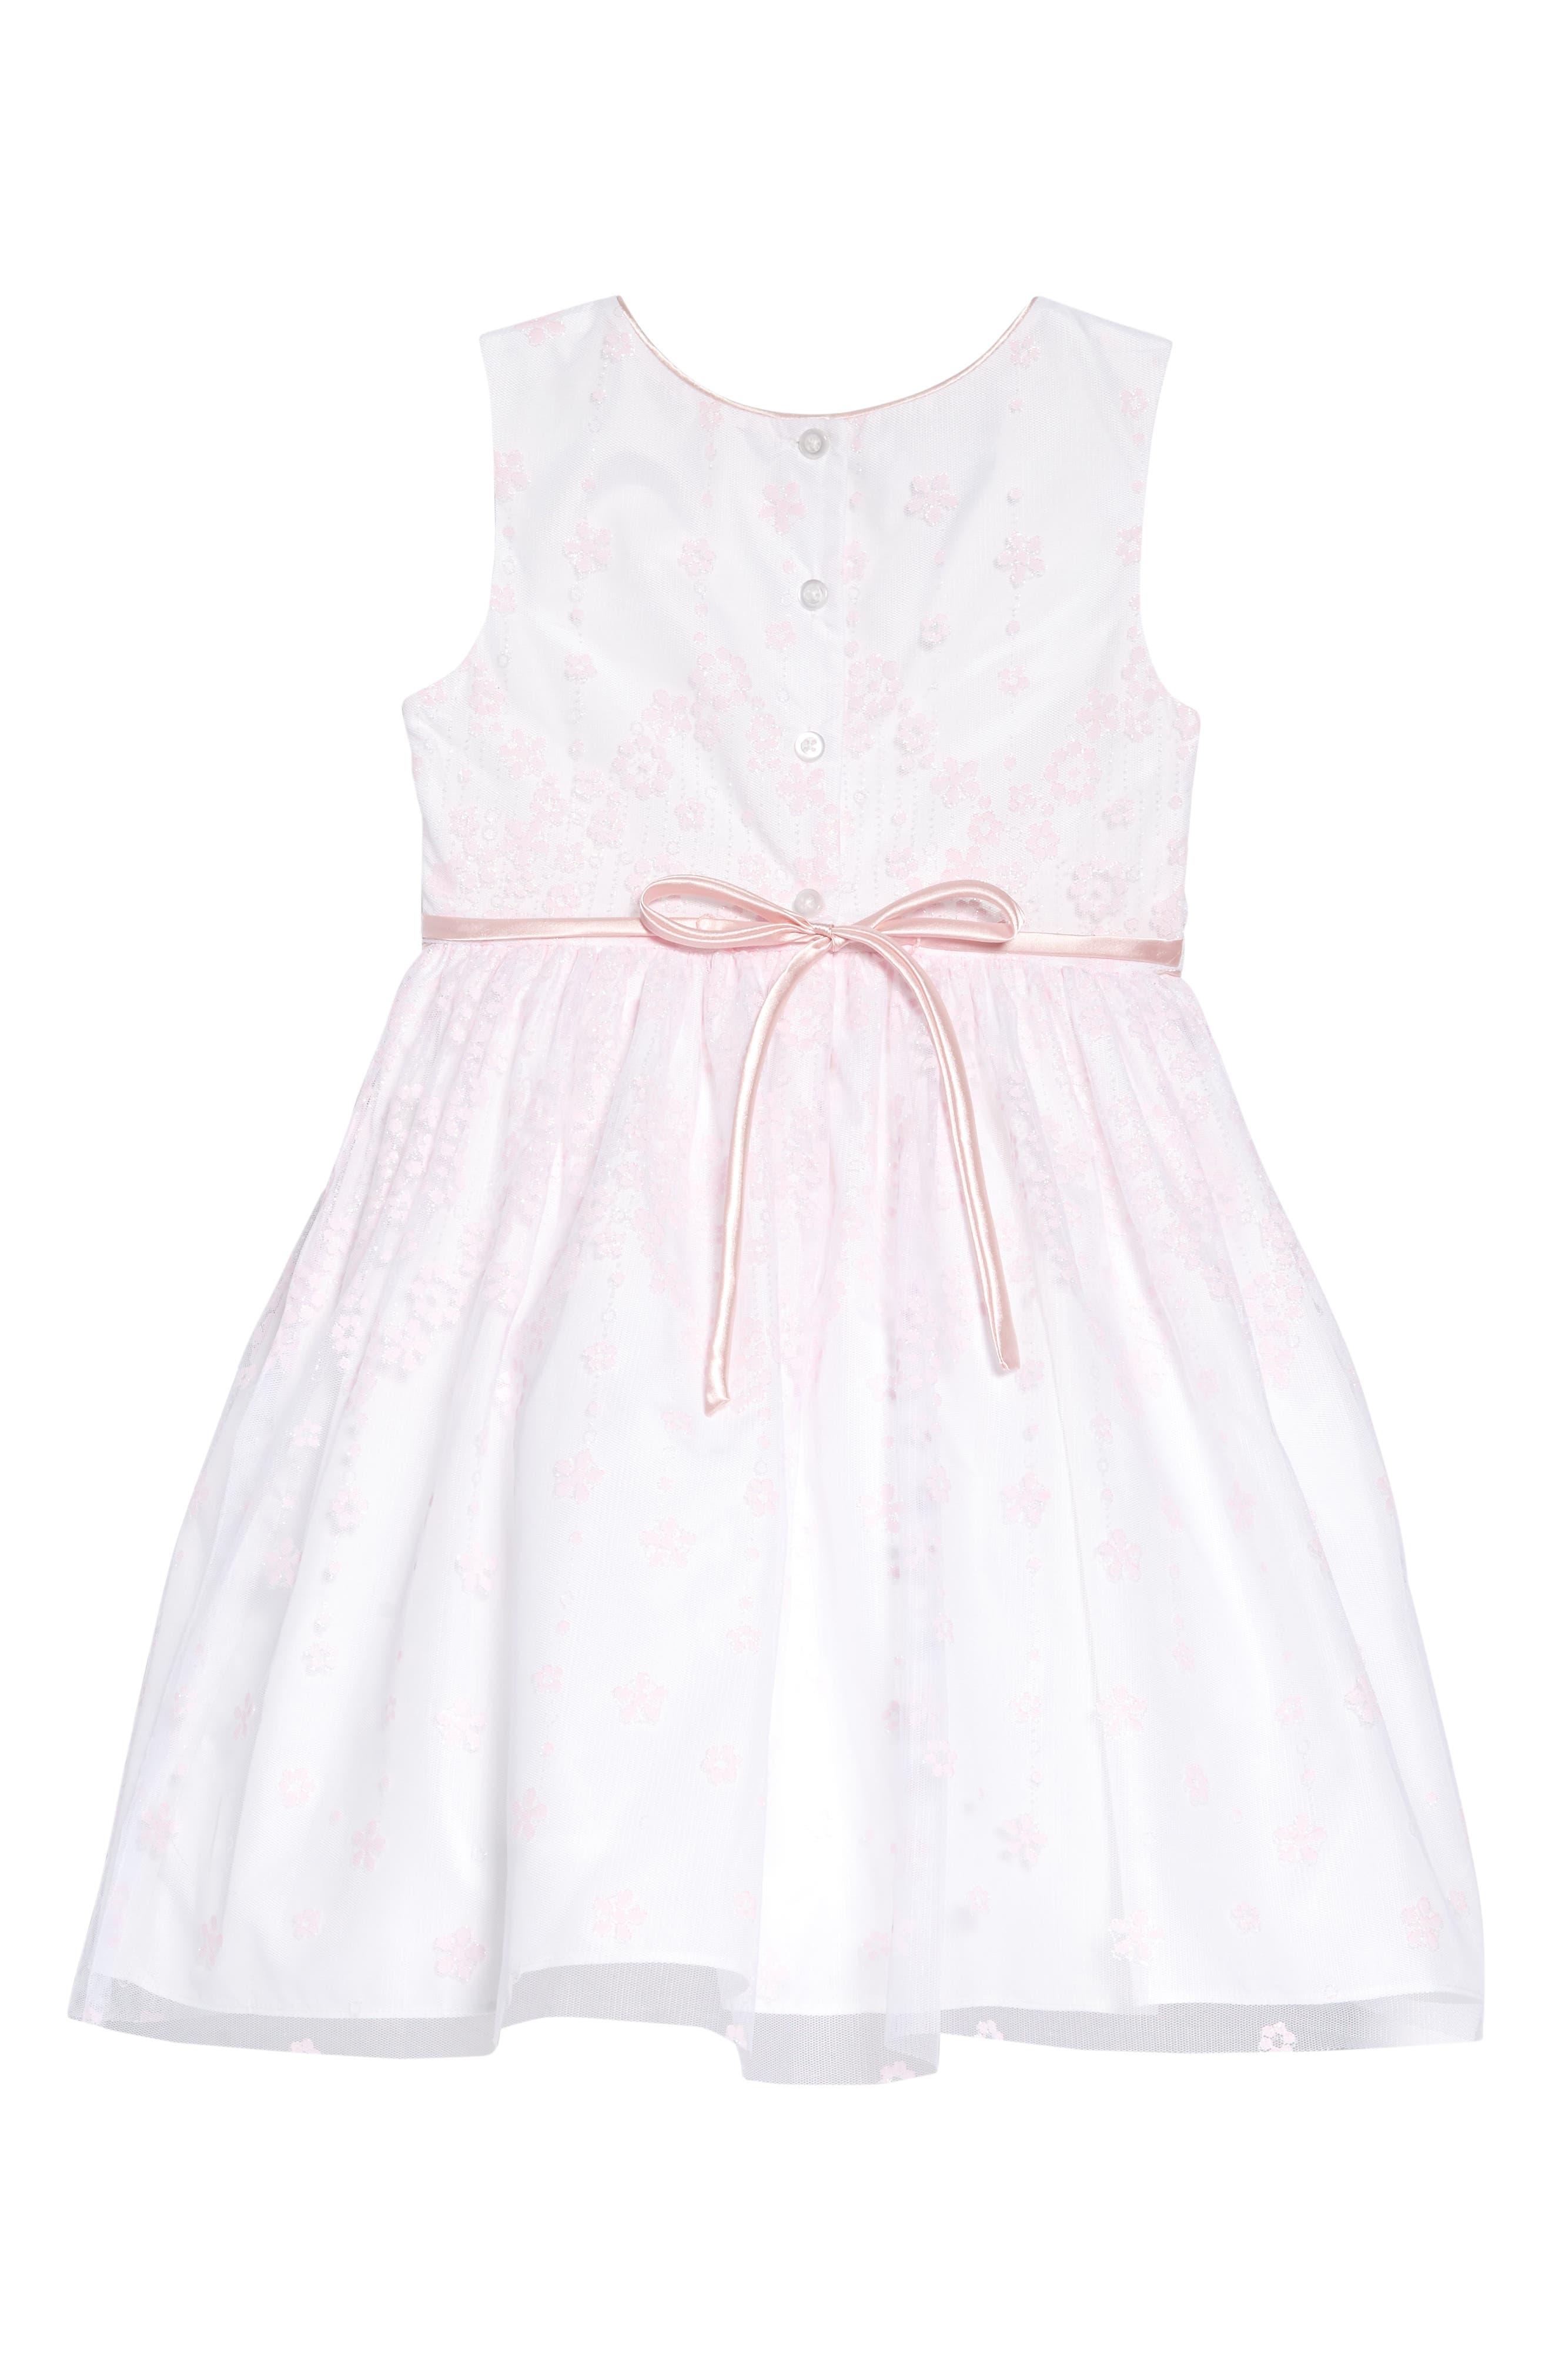 FRAIS, Flower Glitter Fit & Flare Dress, Alternate thumbnail 2, color, PINK